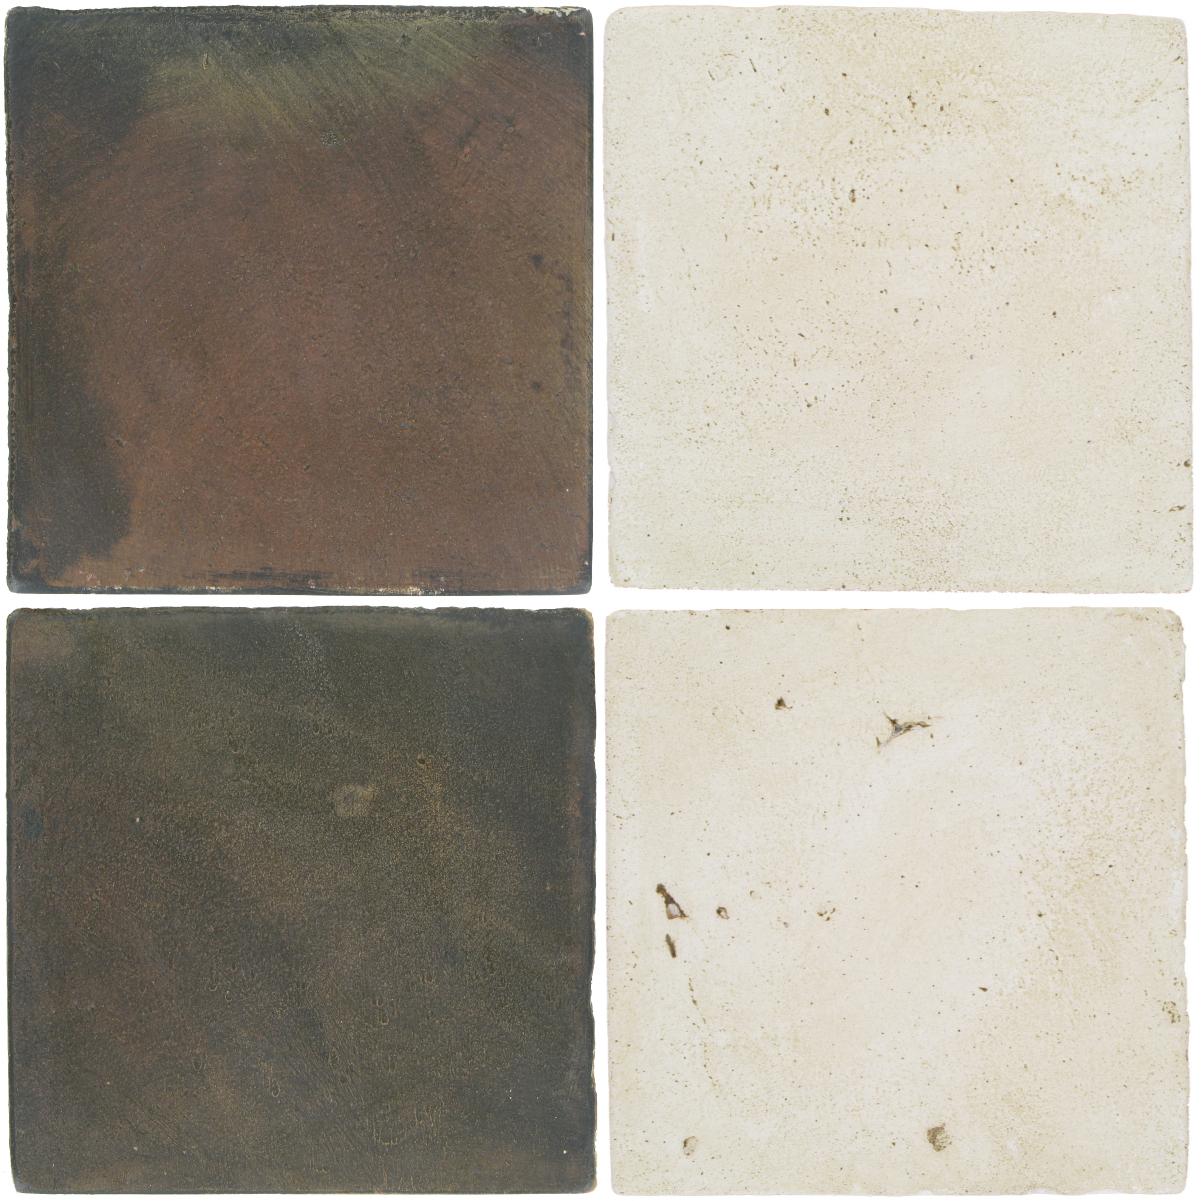 Pedralbes Antique Terracotta  2 Color Combinations  OHS-PSTG Terra Grey + VTG-PGAW Antique White